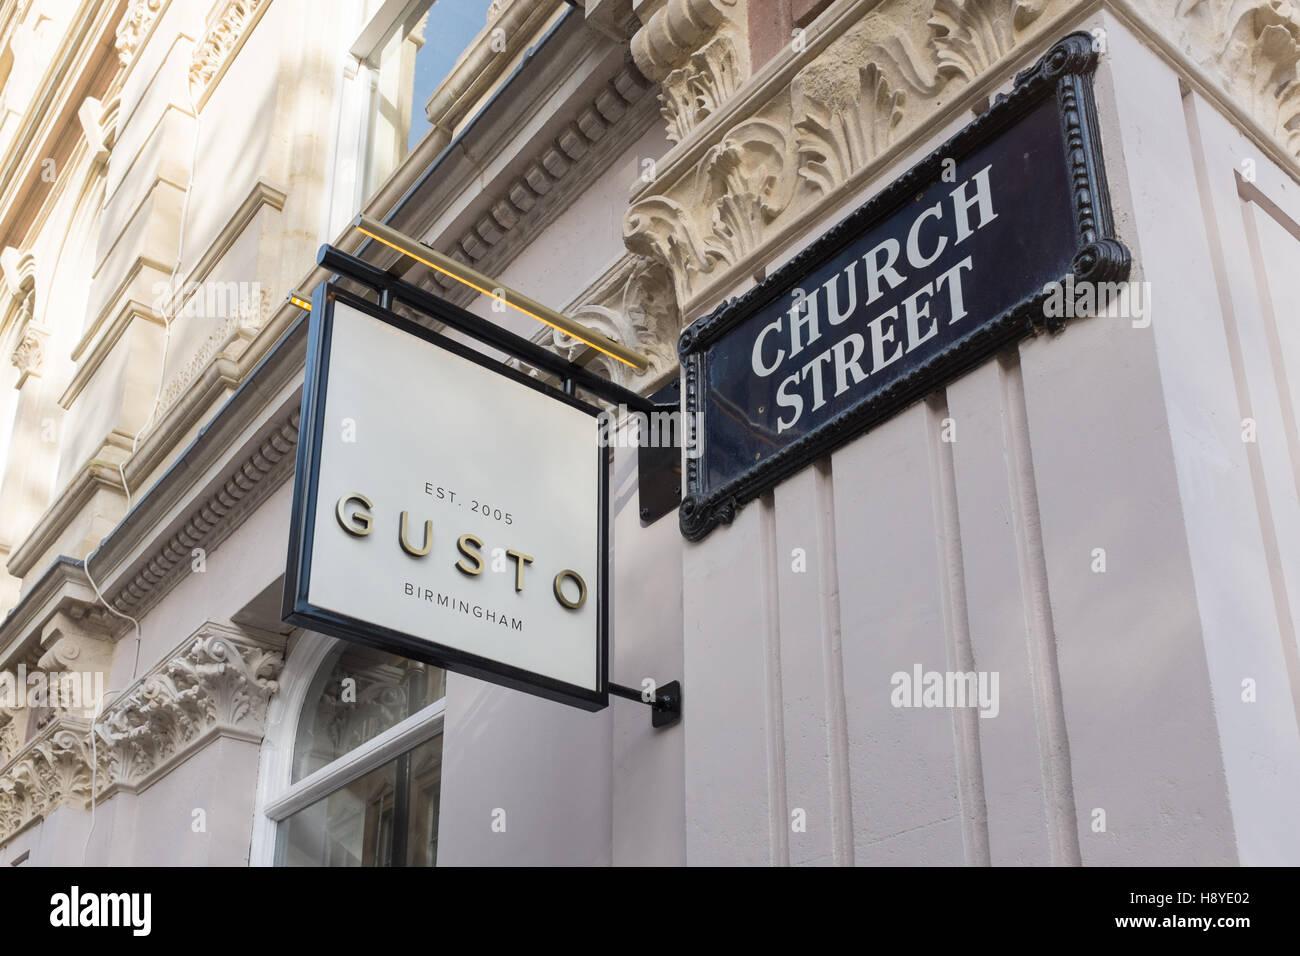 Sign for Gusto italian restaurant in Colmore Row, Birmingham - Stock Image